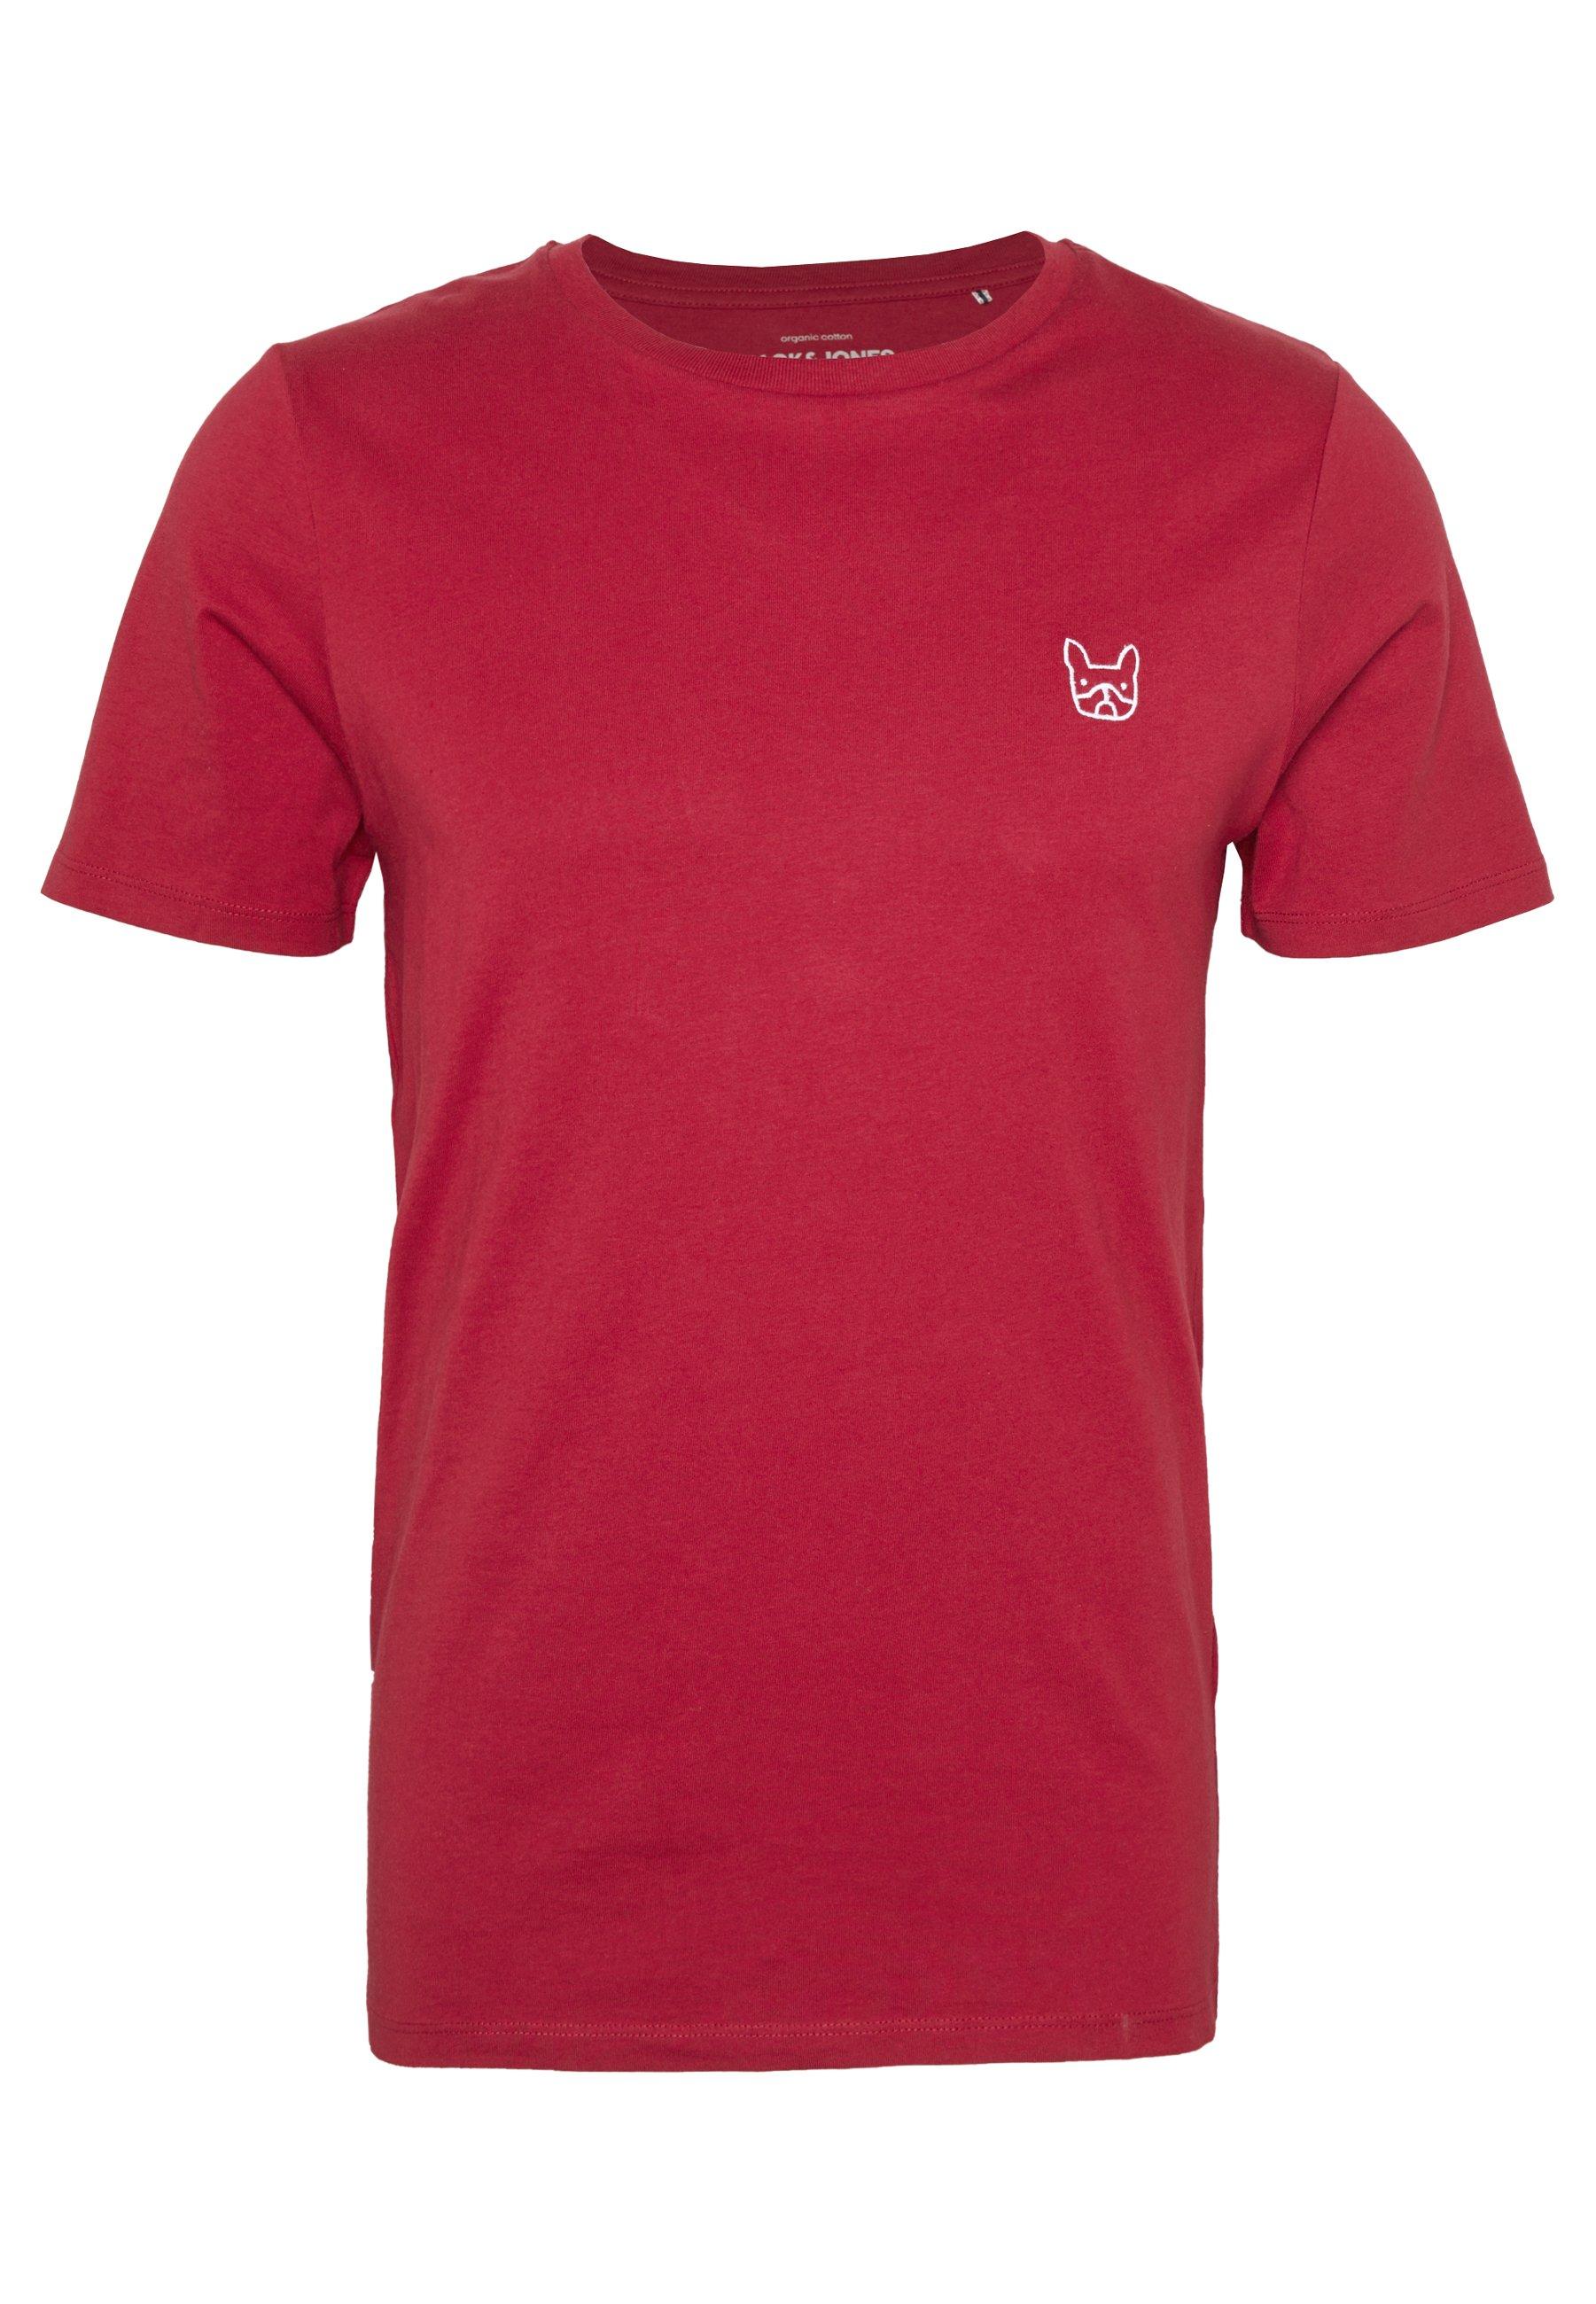 Jack & Jones JJEDENIM LOGO TEE O-NECK - T-shirt basic - rio red/white